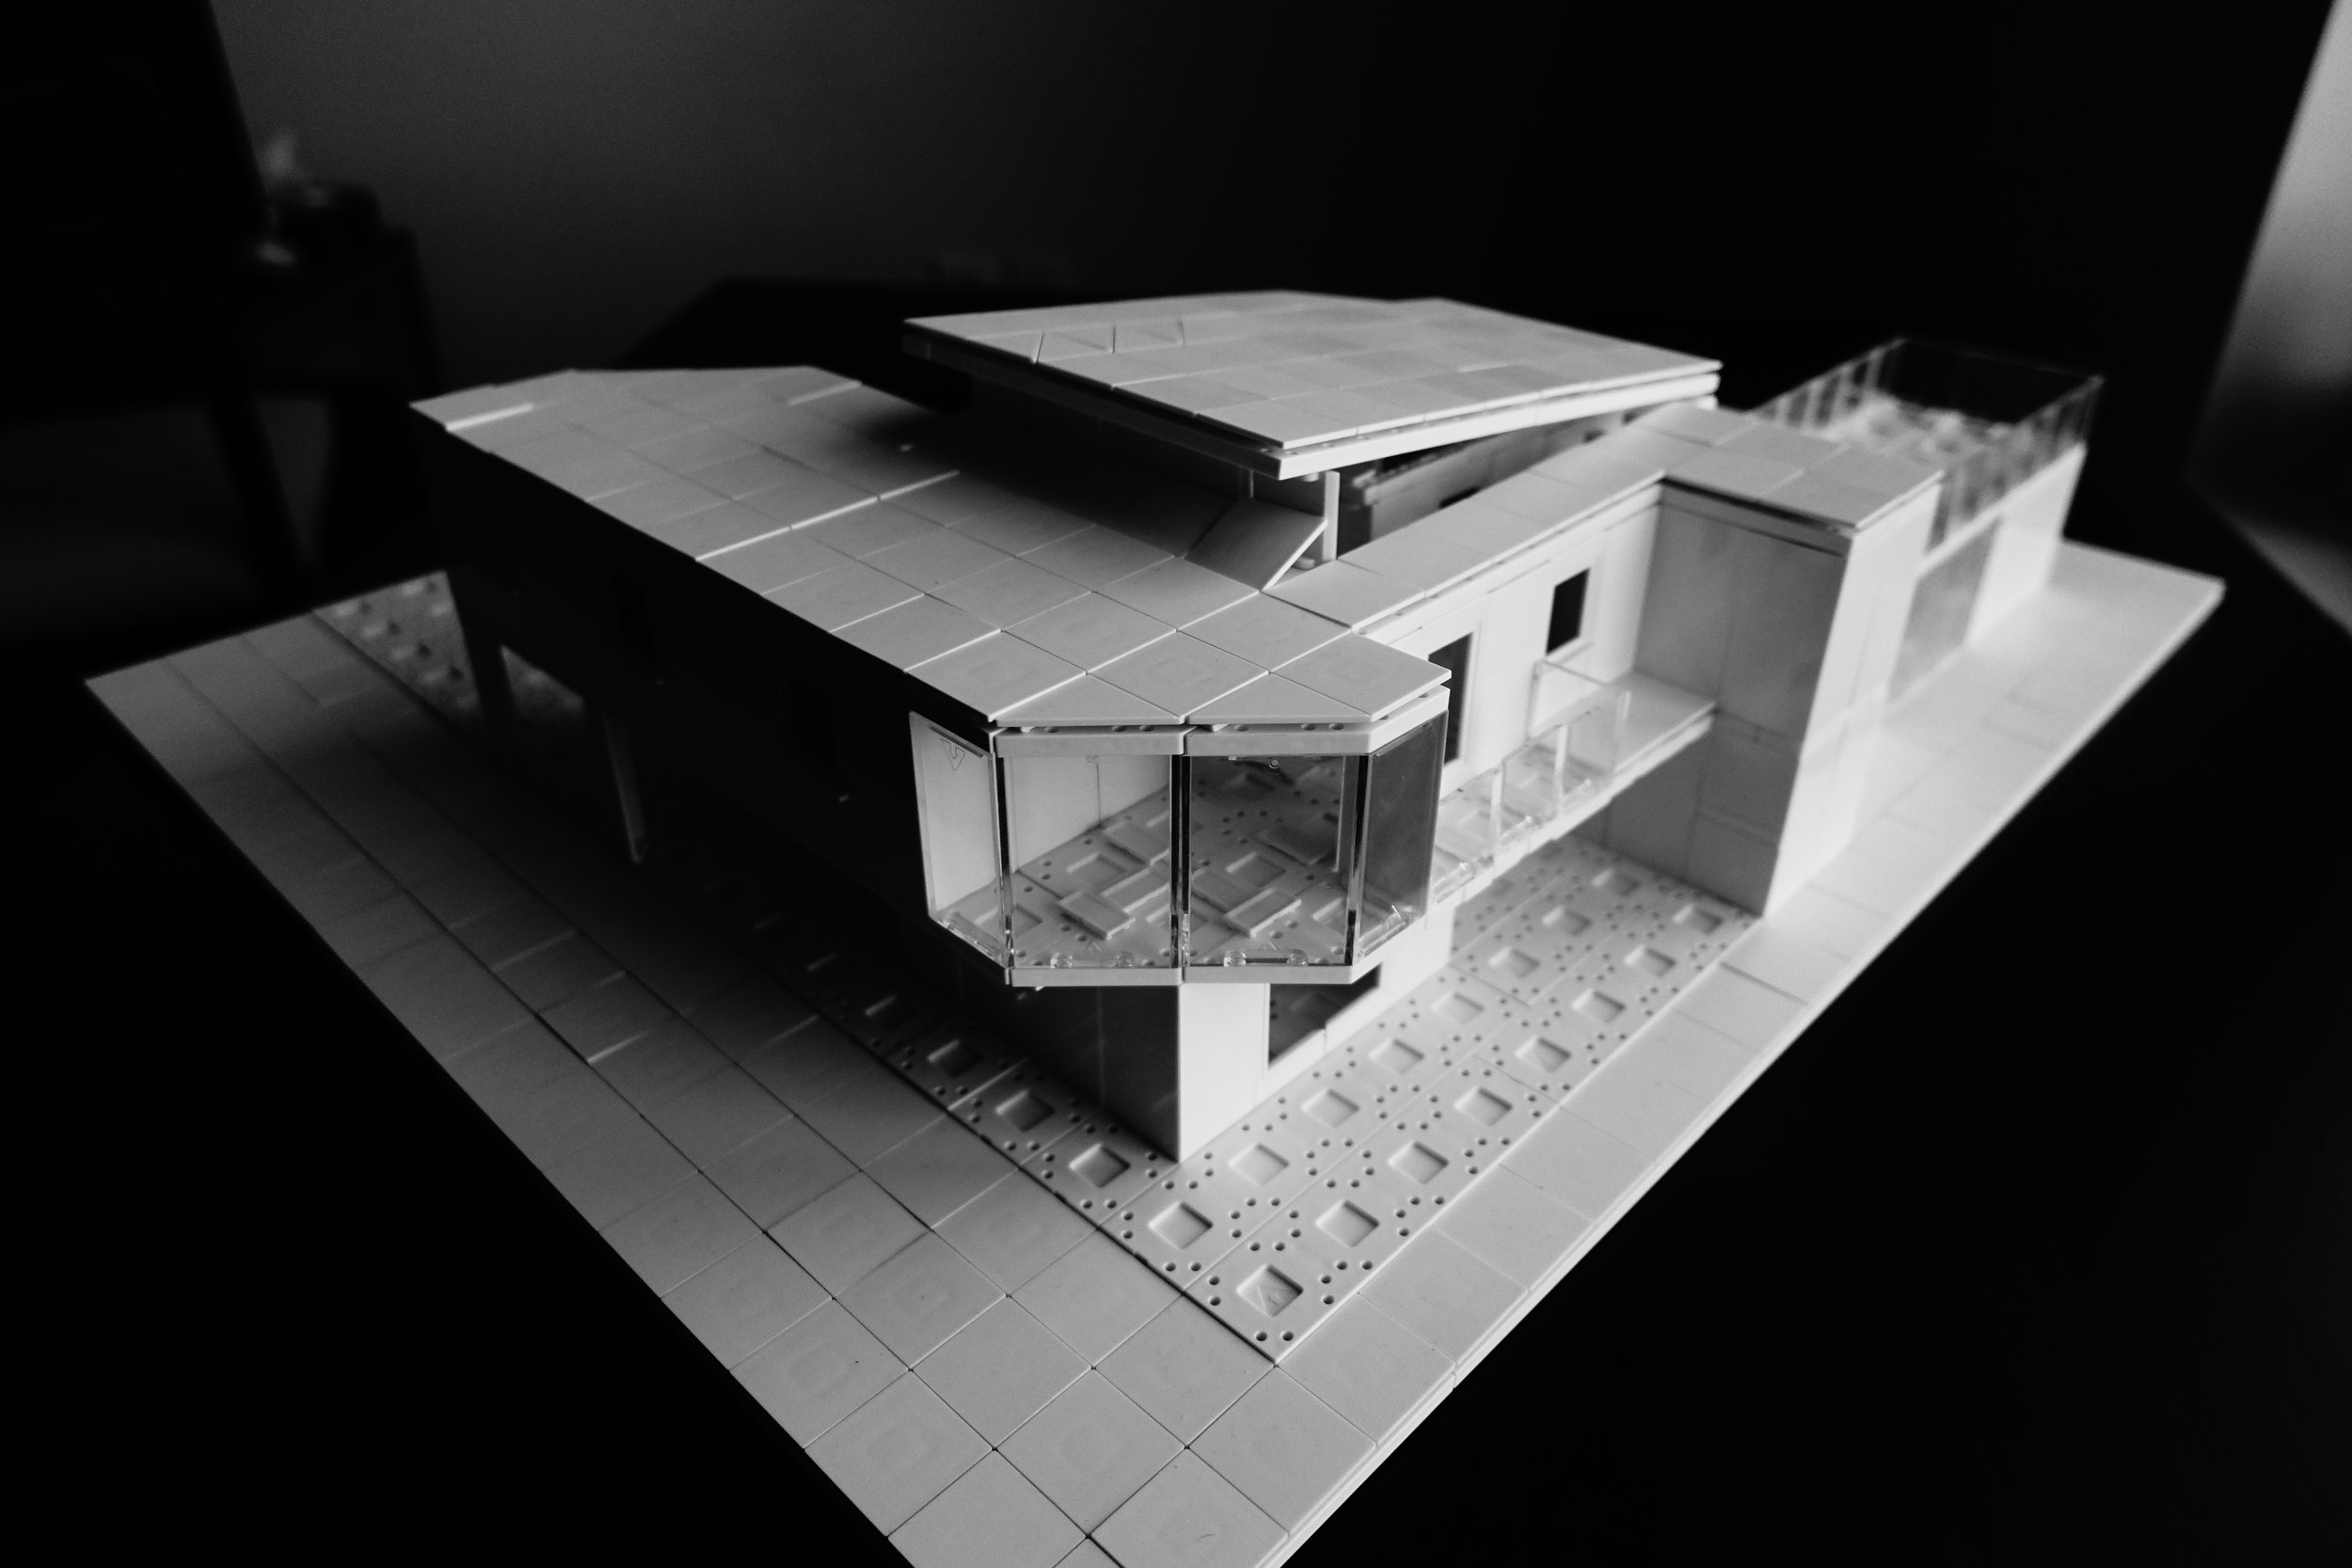 Arckit Model 35B - Using Angled Tiles